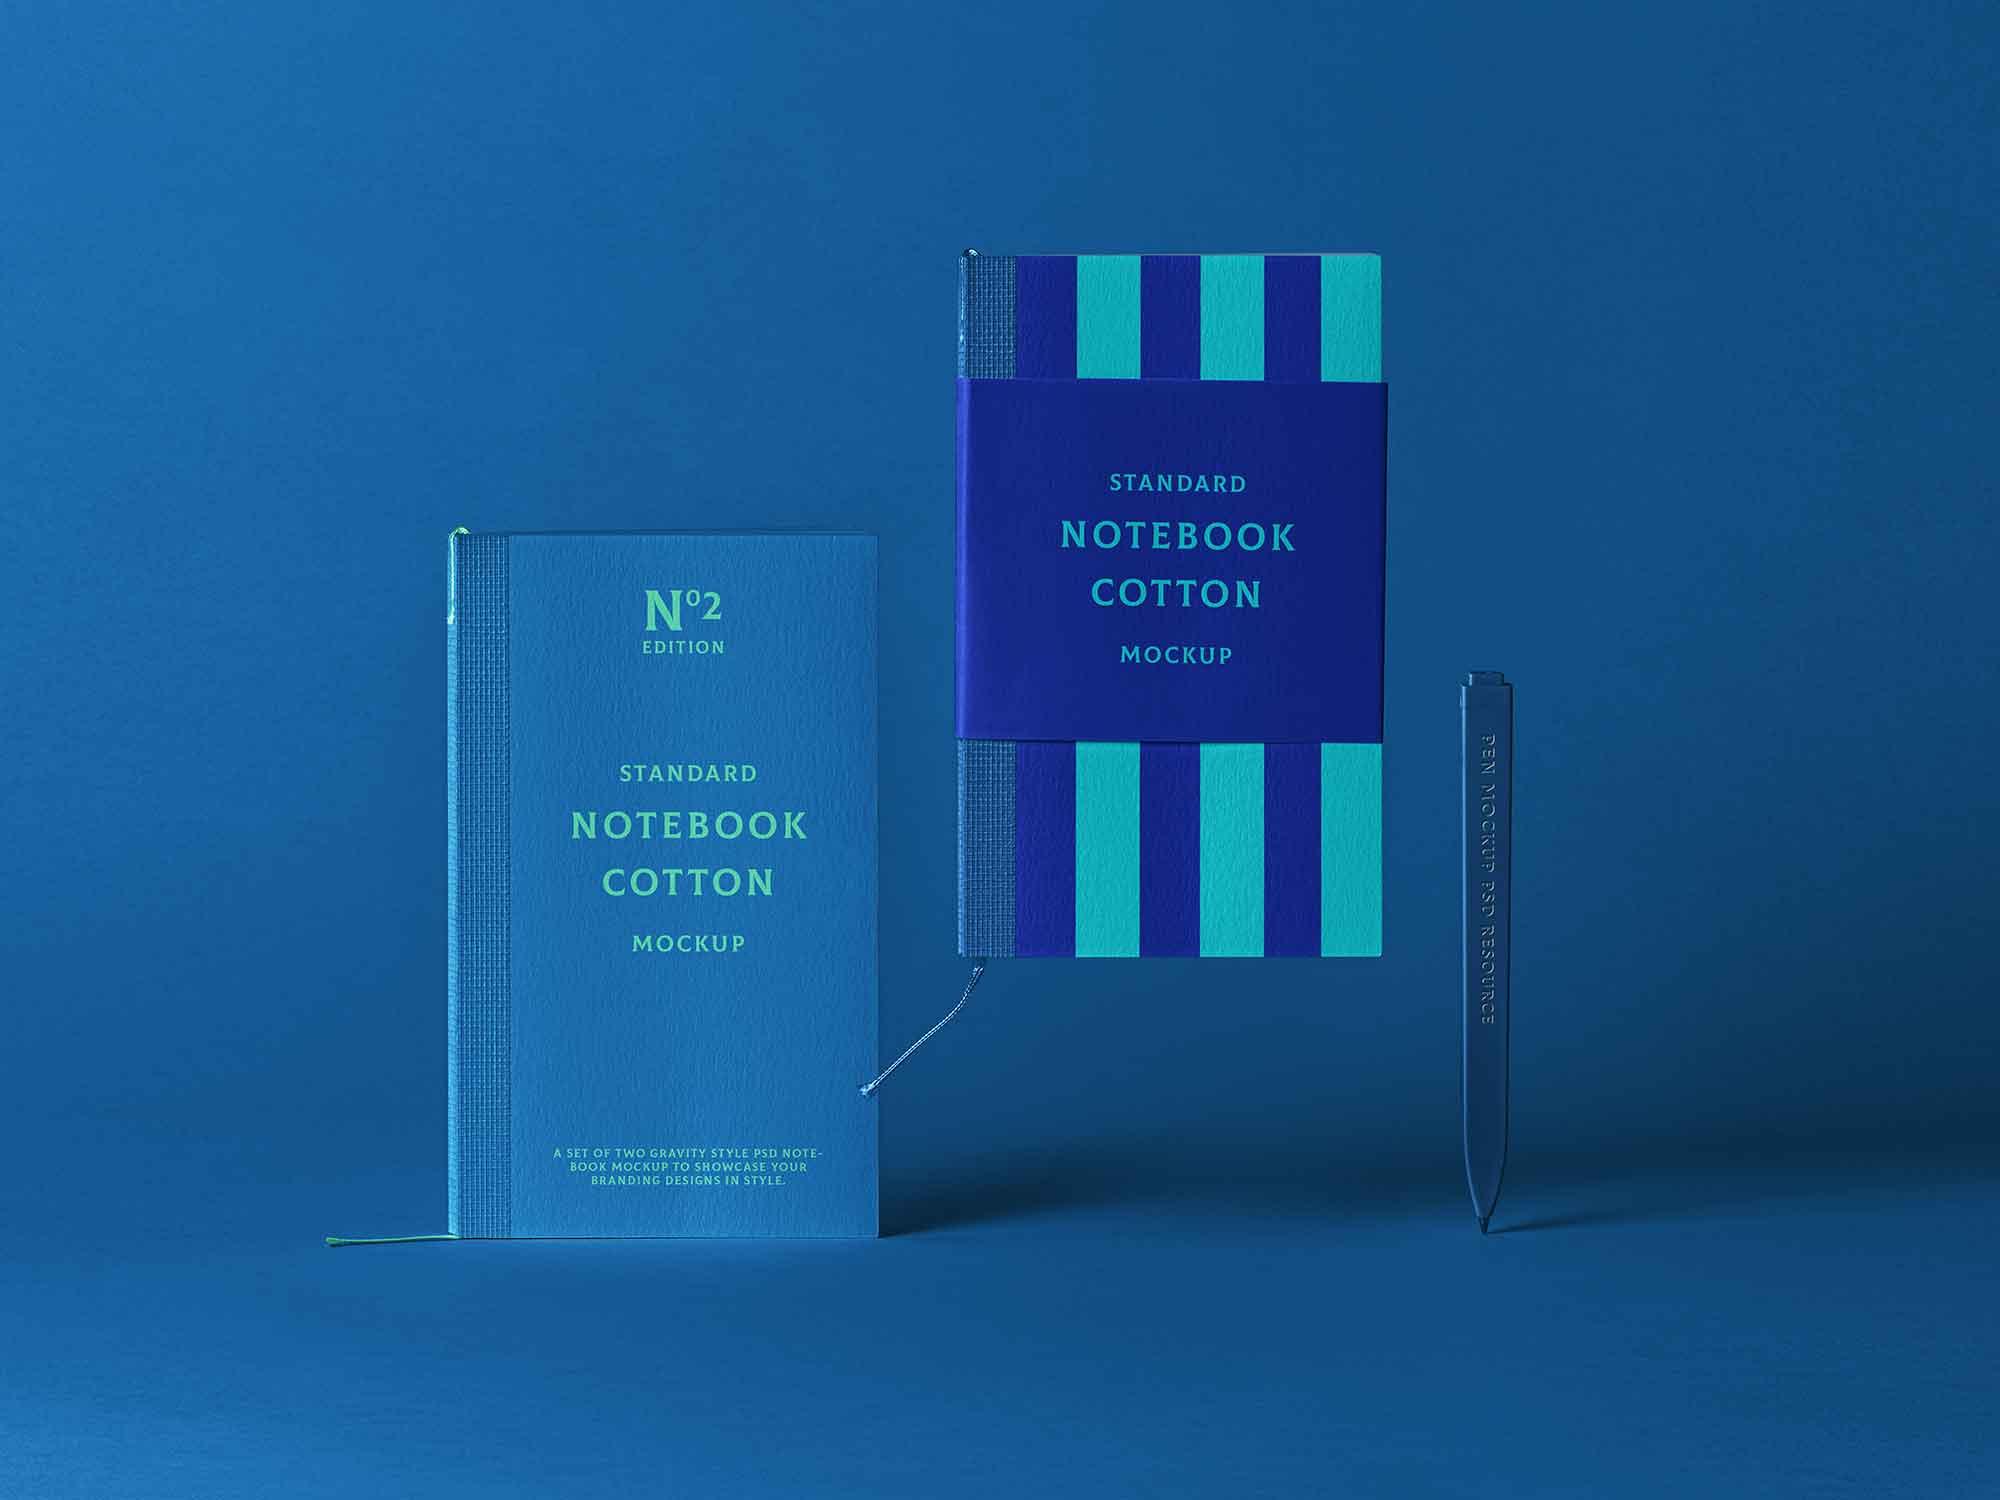 Cotton Notebook Mockup 2